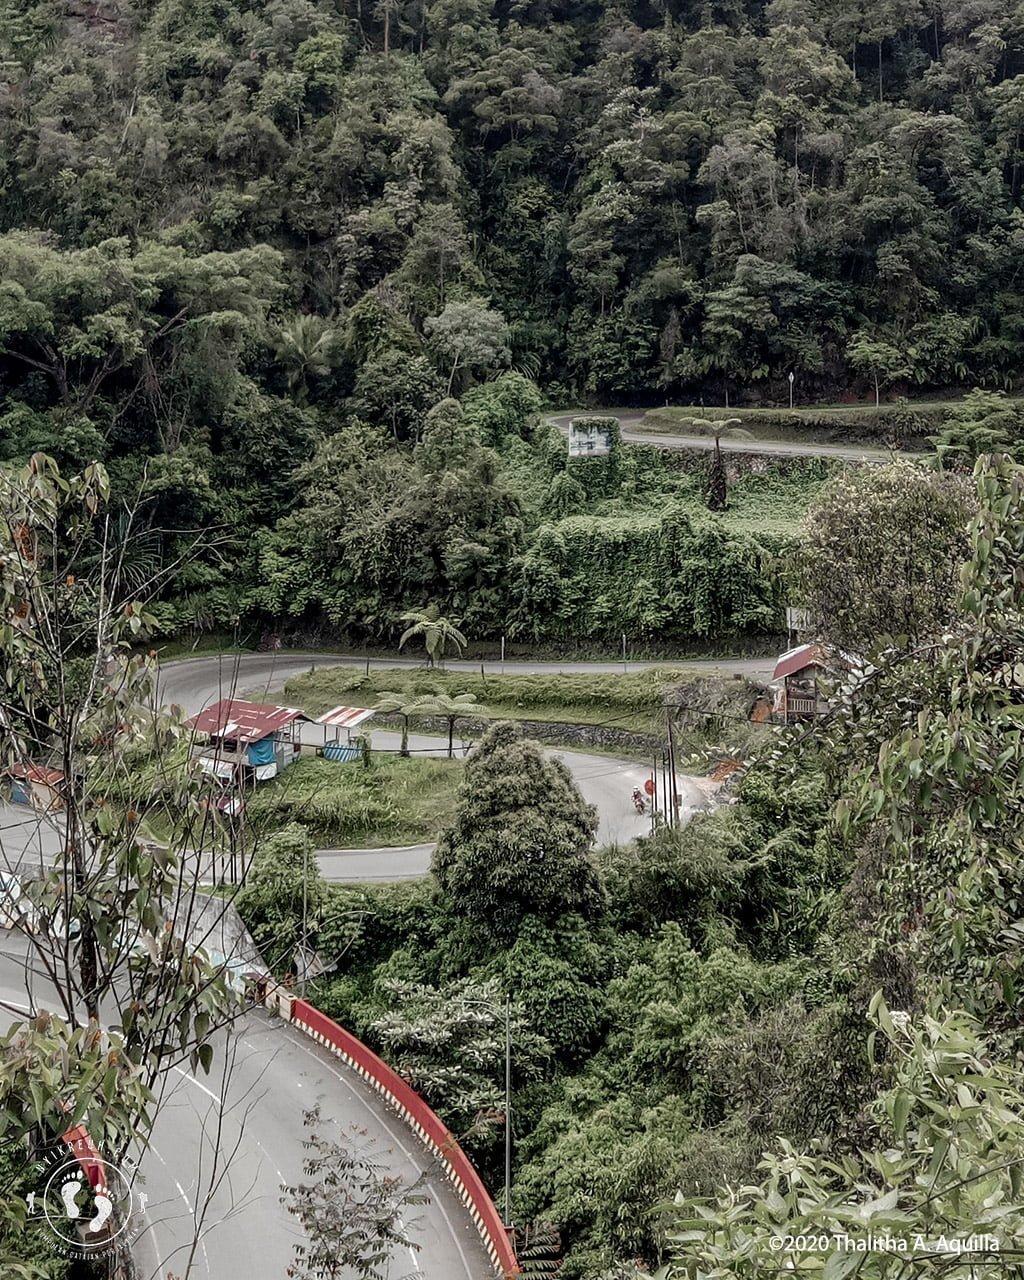 Jalan Kelok 9 Sumatra Barat